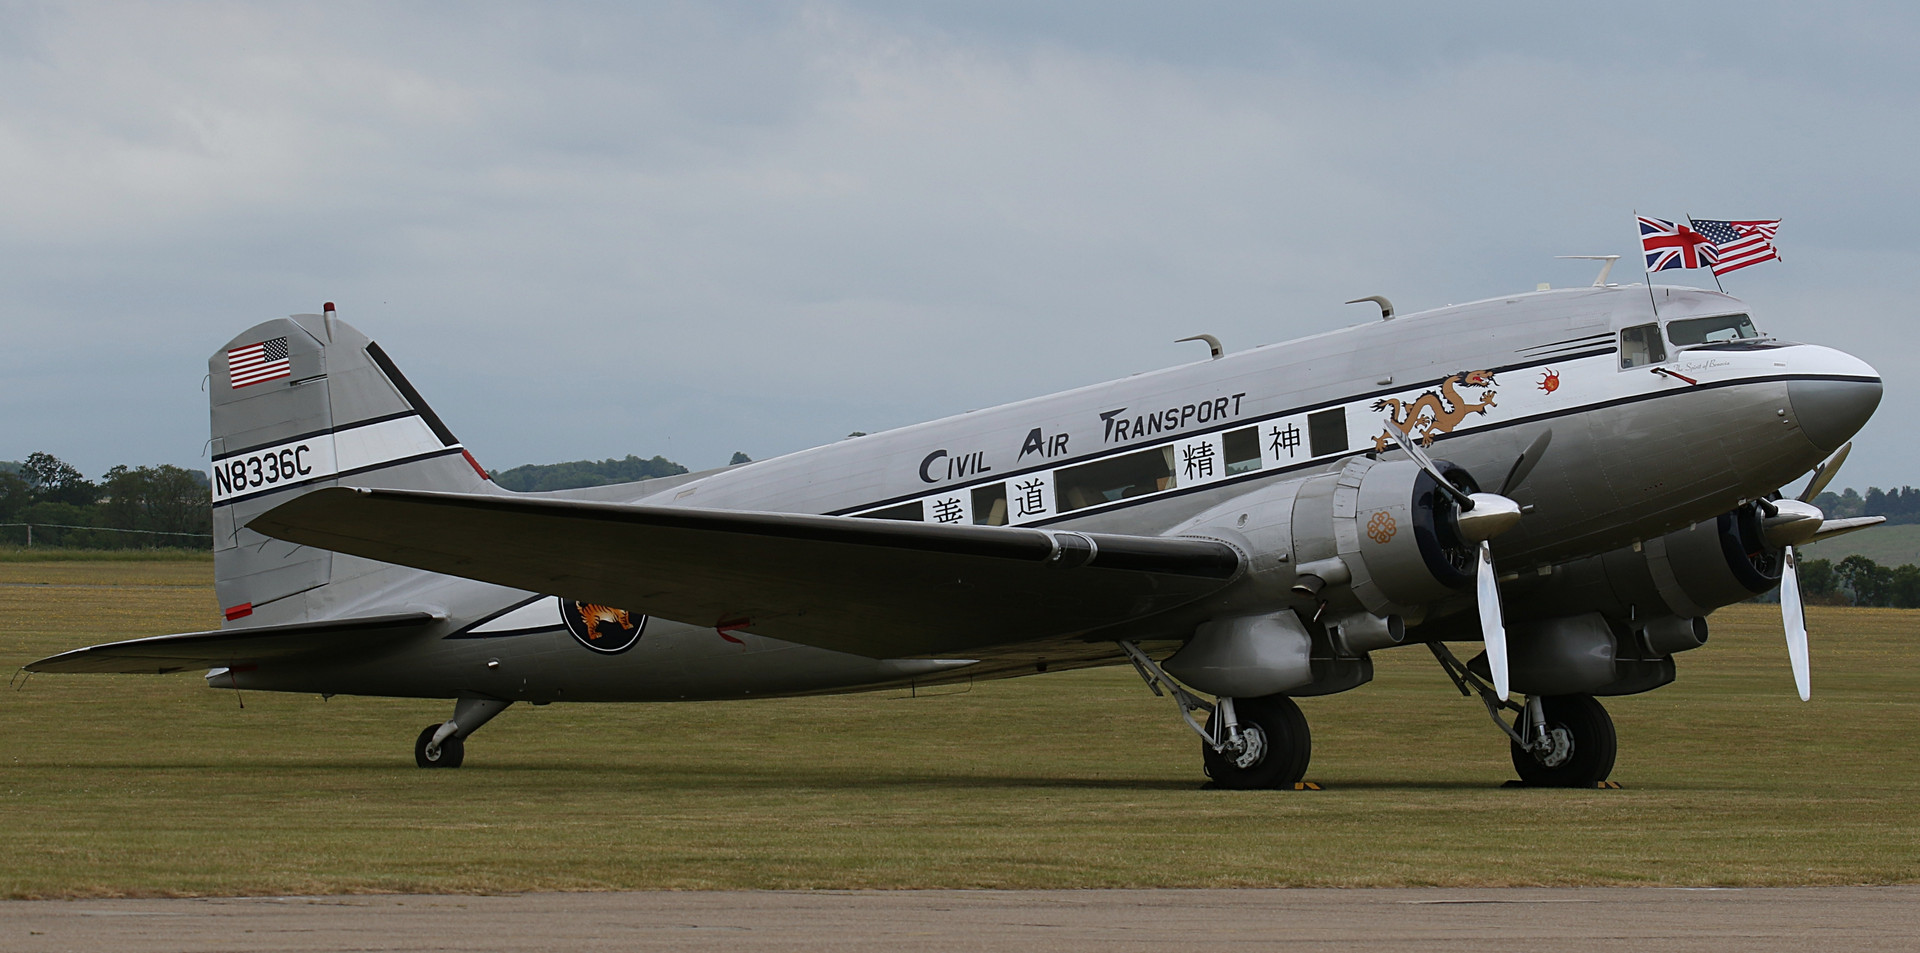 Civil Air Transport Daks over Duxford Ju